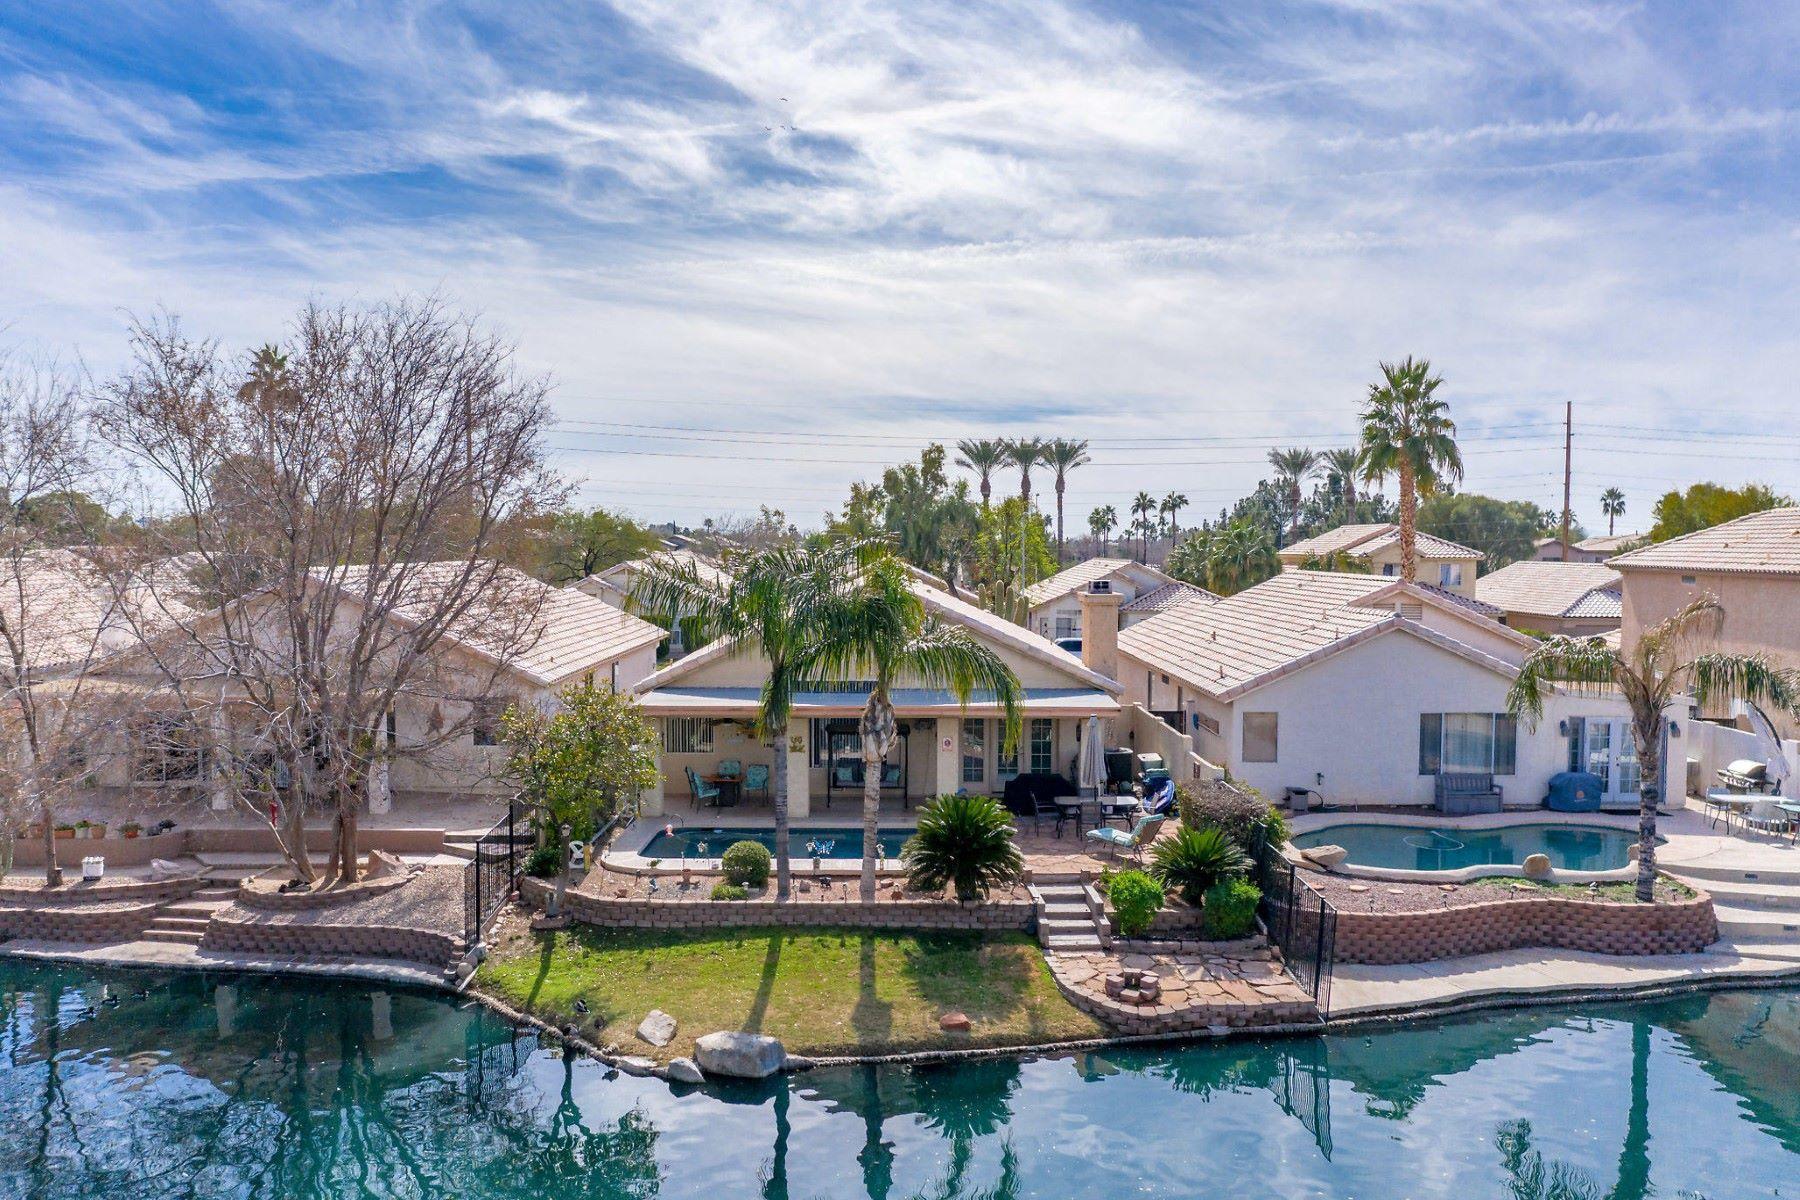 Single Family Homes για την Πώληση στο The Springs 1410 E CINDY ST, Chandler, Αριζονα 85225 Ηνωμένες Πολιτείες